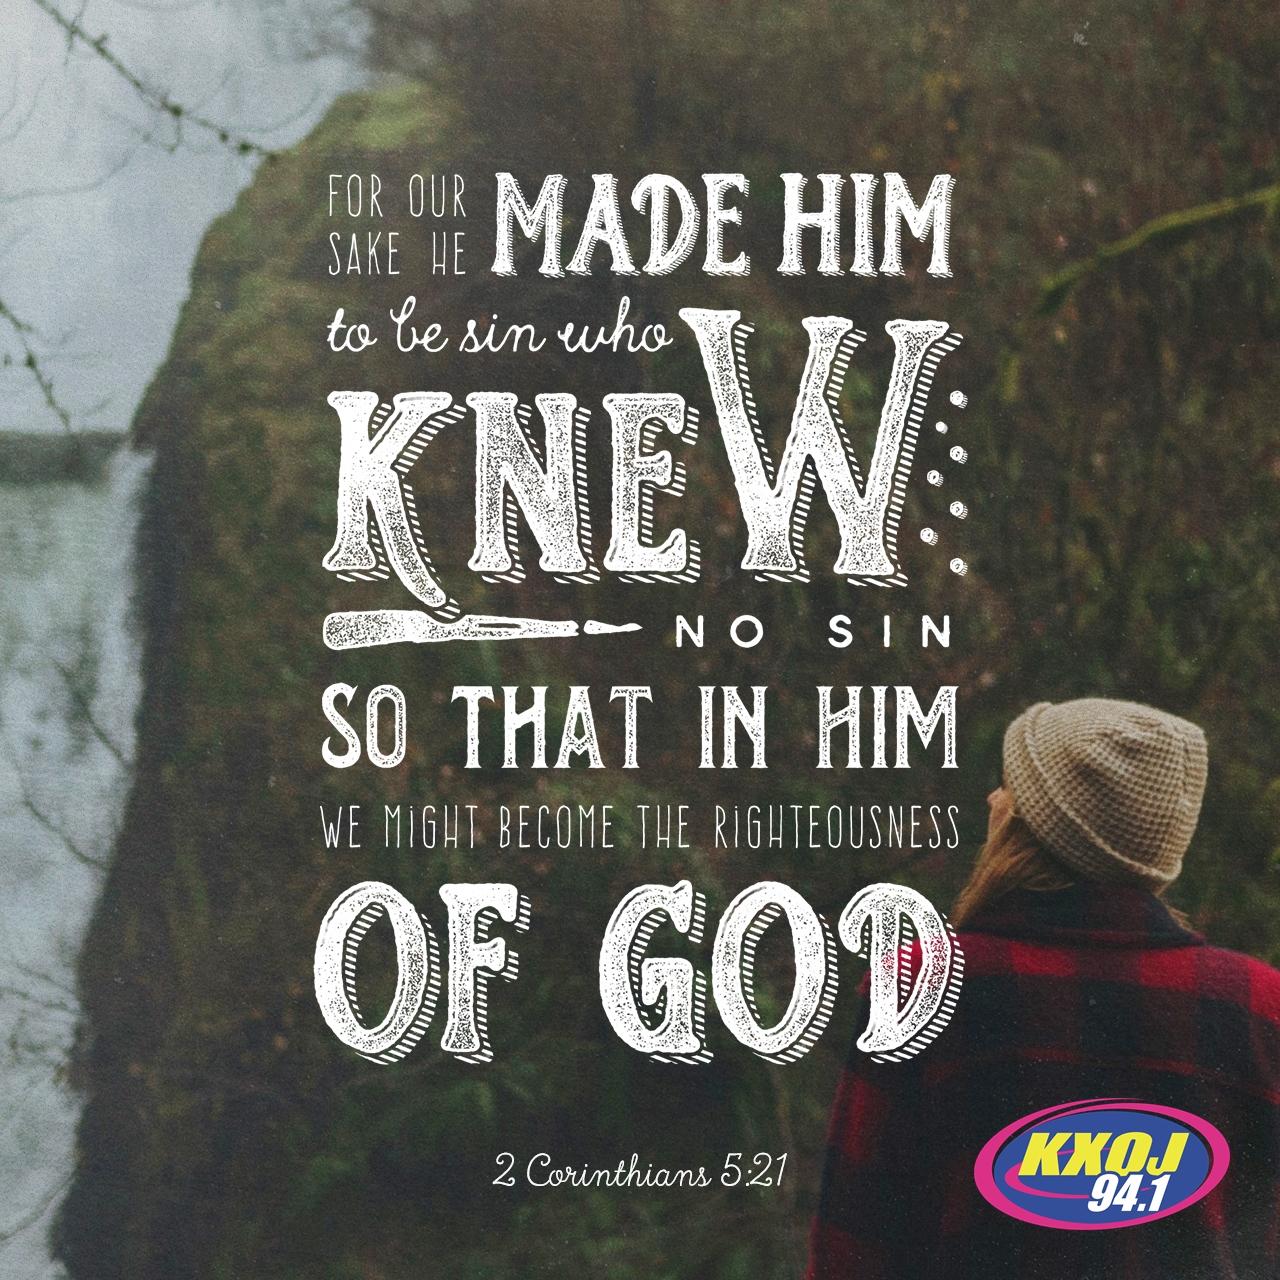 January 10th - 2 Corinthians 5:21